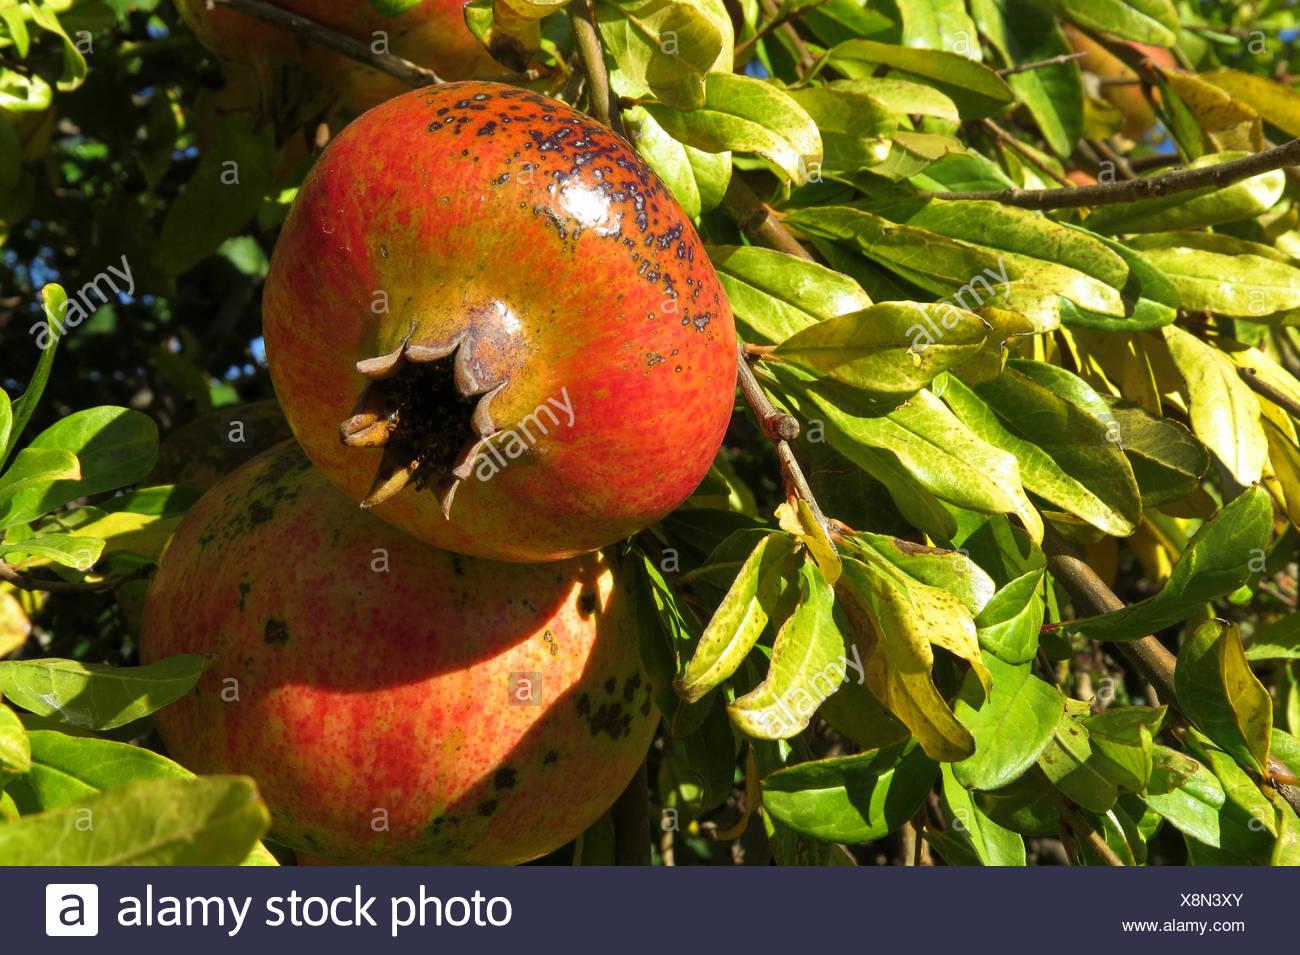 Granatapfel, Granat-Apfel (Punica granatum), Granataepfel am Baum, Spanien | pomegranate, anar (Punica granatum), fruits on a tr - Stock Image